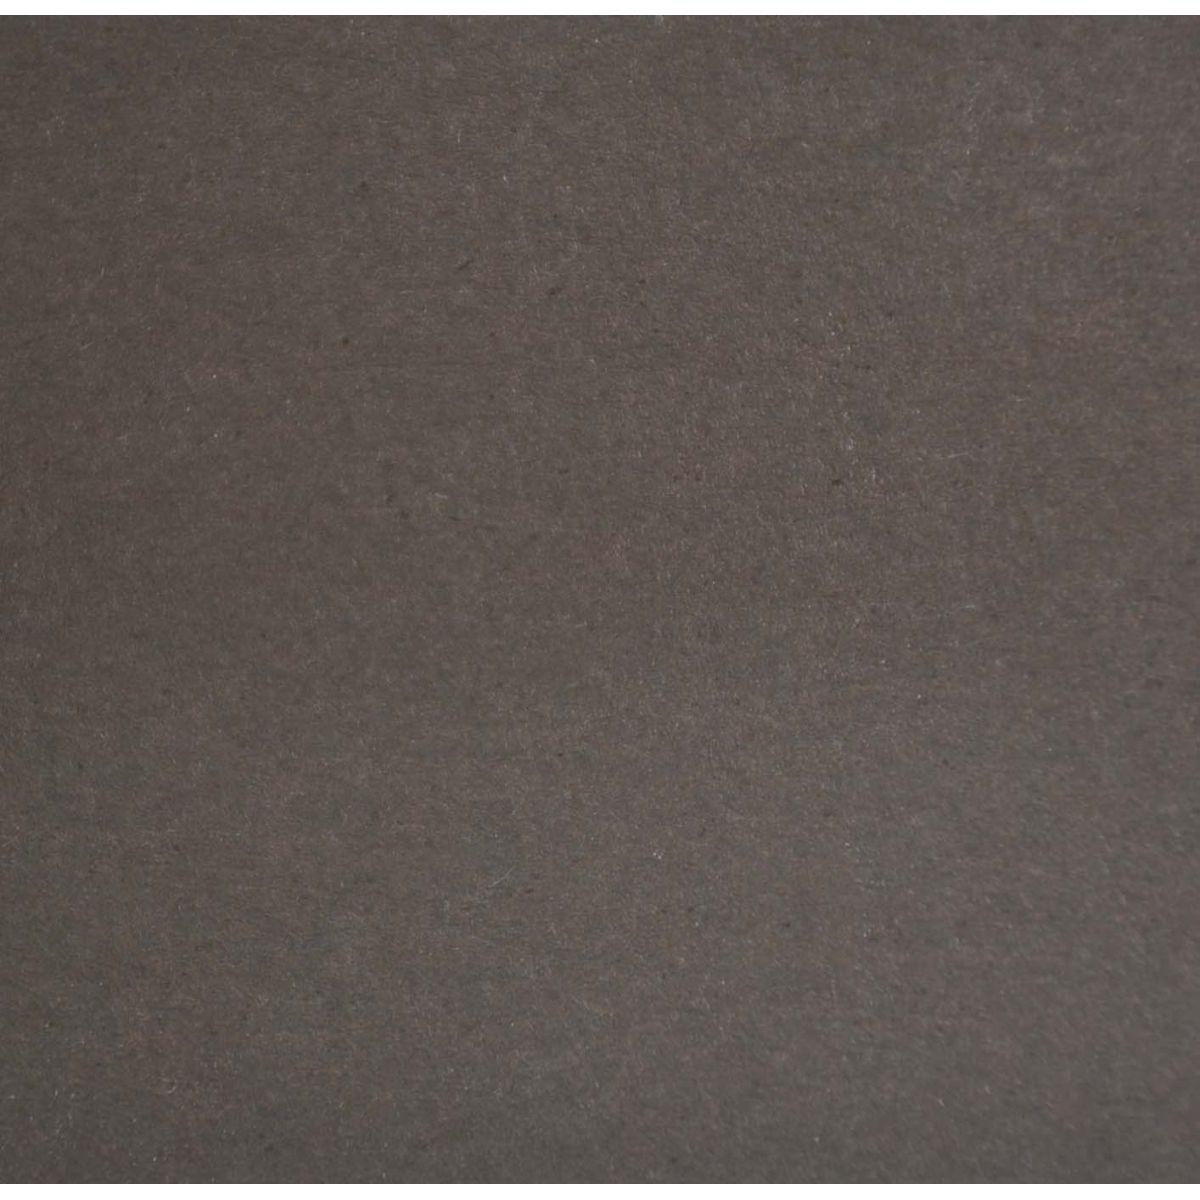 Papel PopSet Hot Brown - 400g